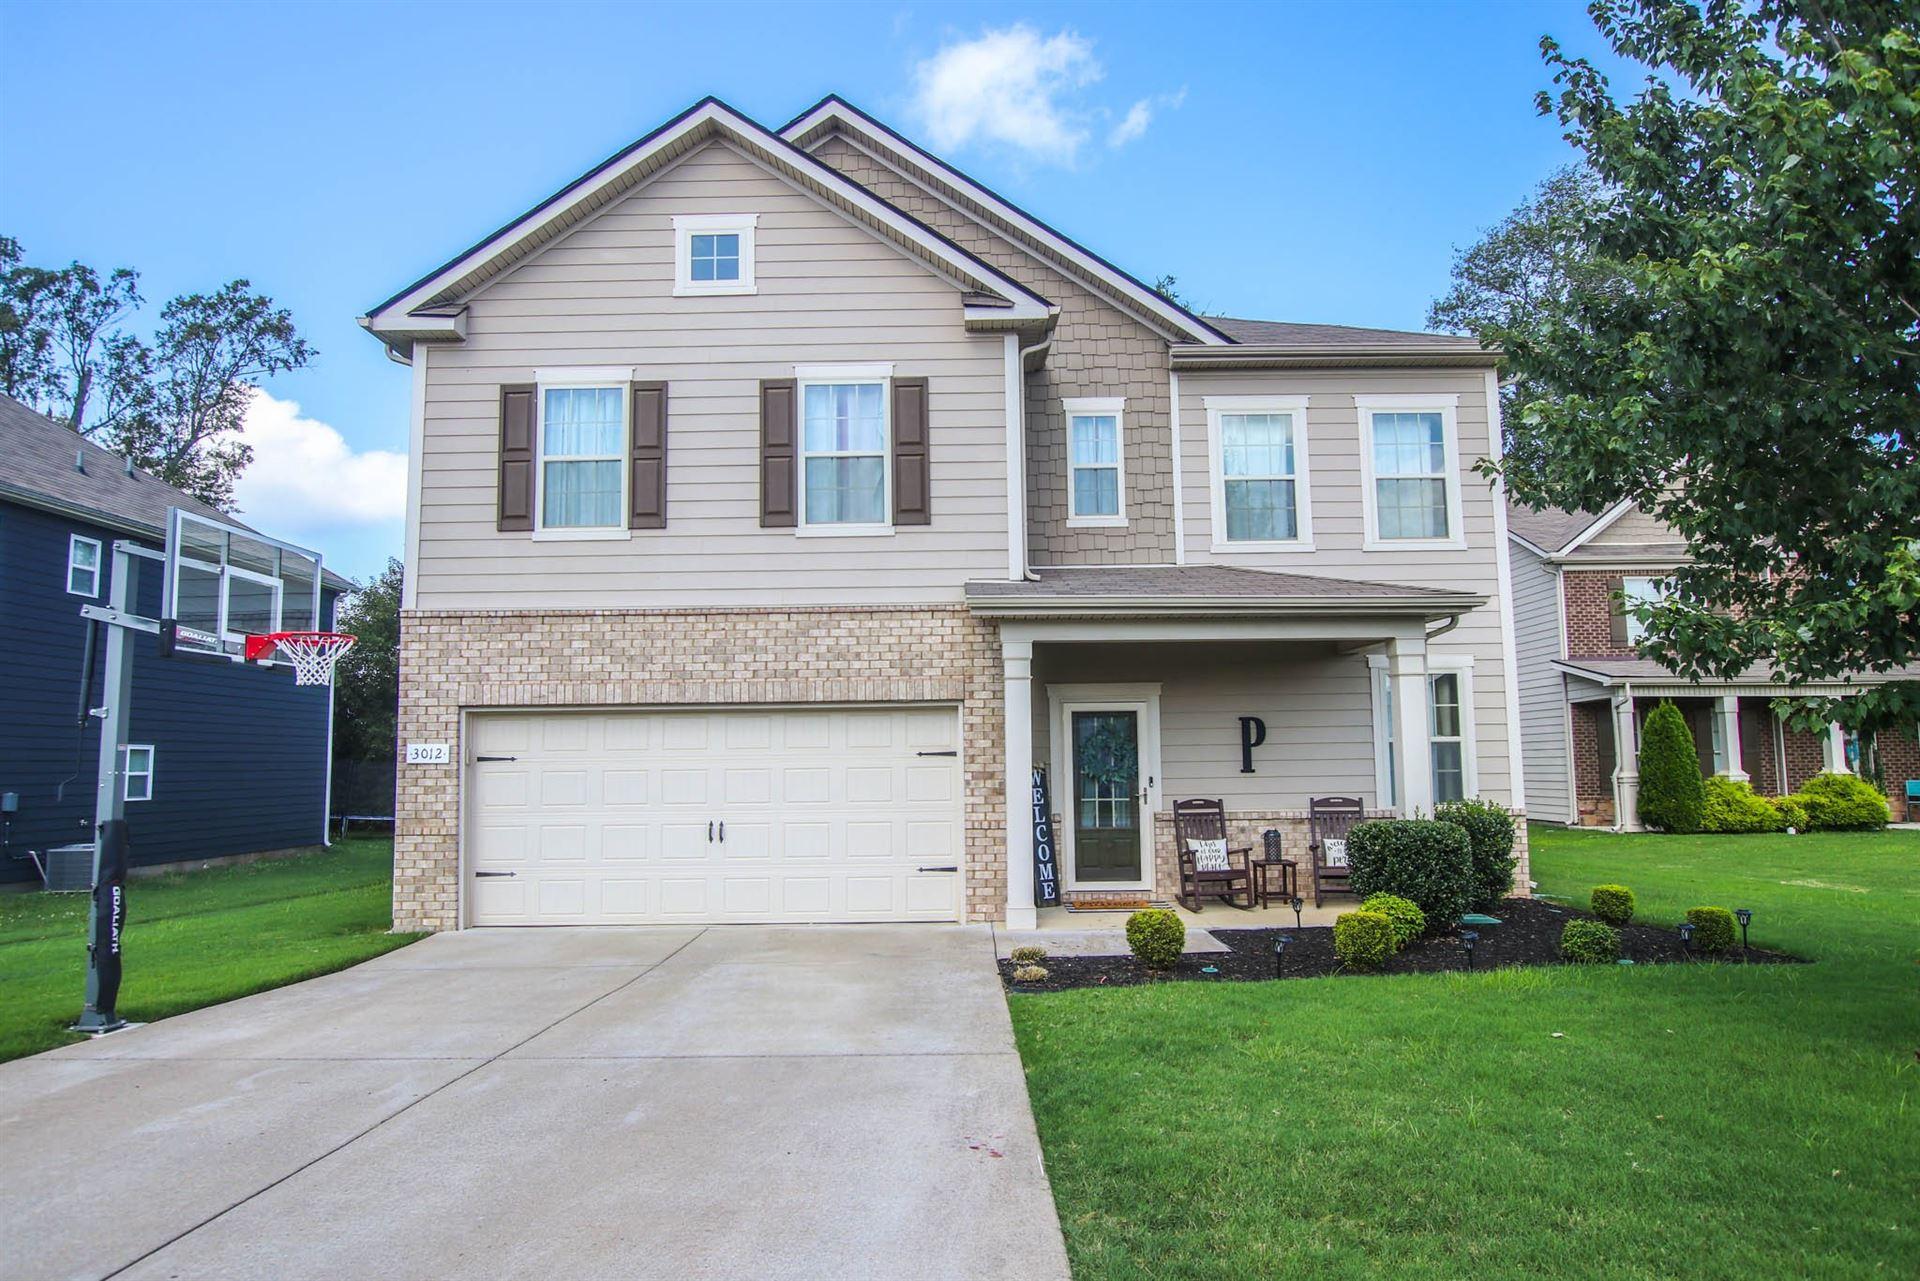 3012 Allerton Way, Murfreesboro, TN 37128 - MLS#: 2273300